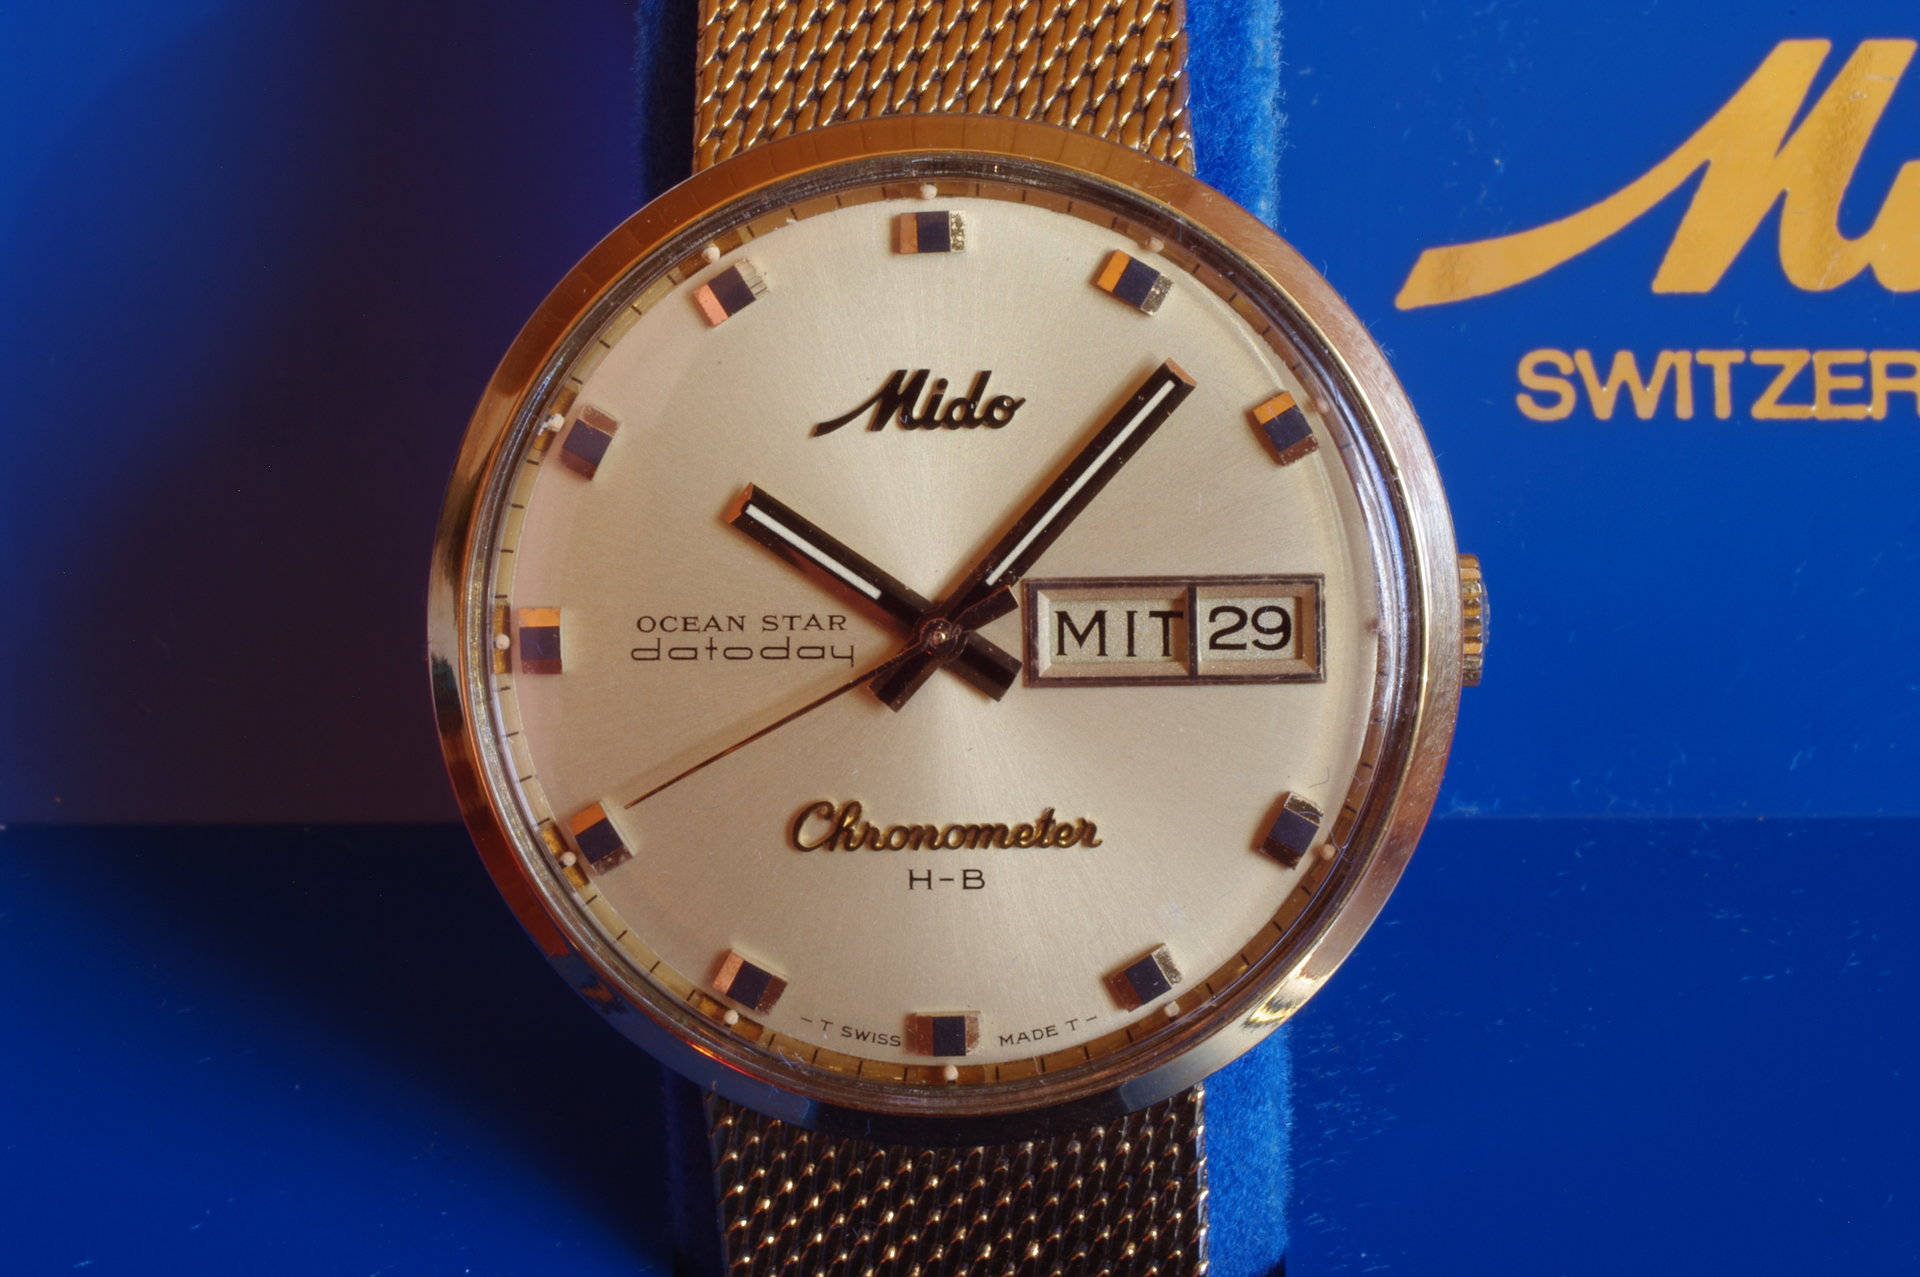 6ab5a7f626c Erledigt  - Mido Ocean Star Chronometer H-B Vintage